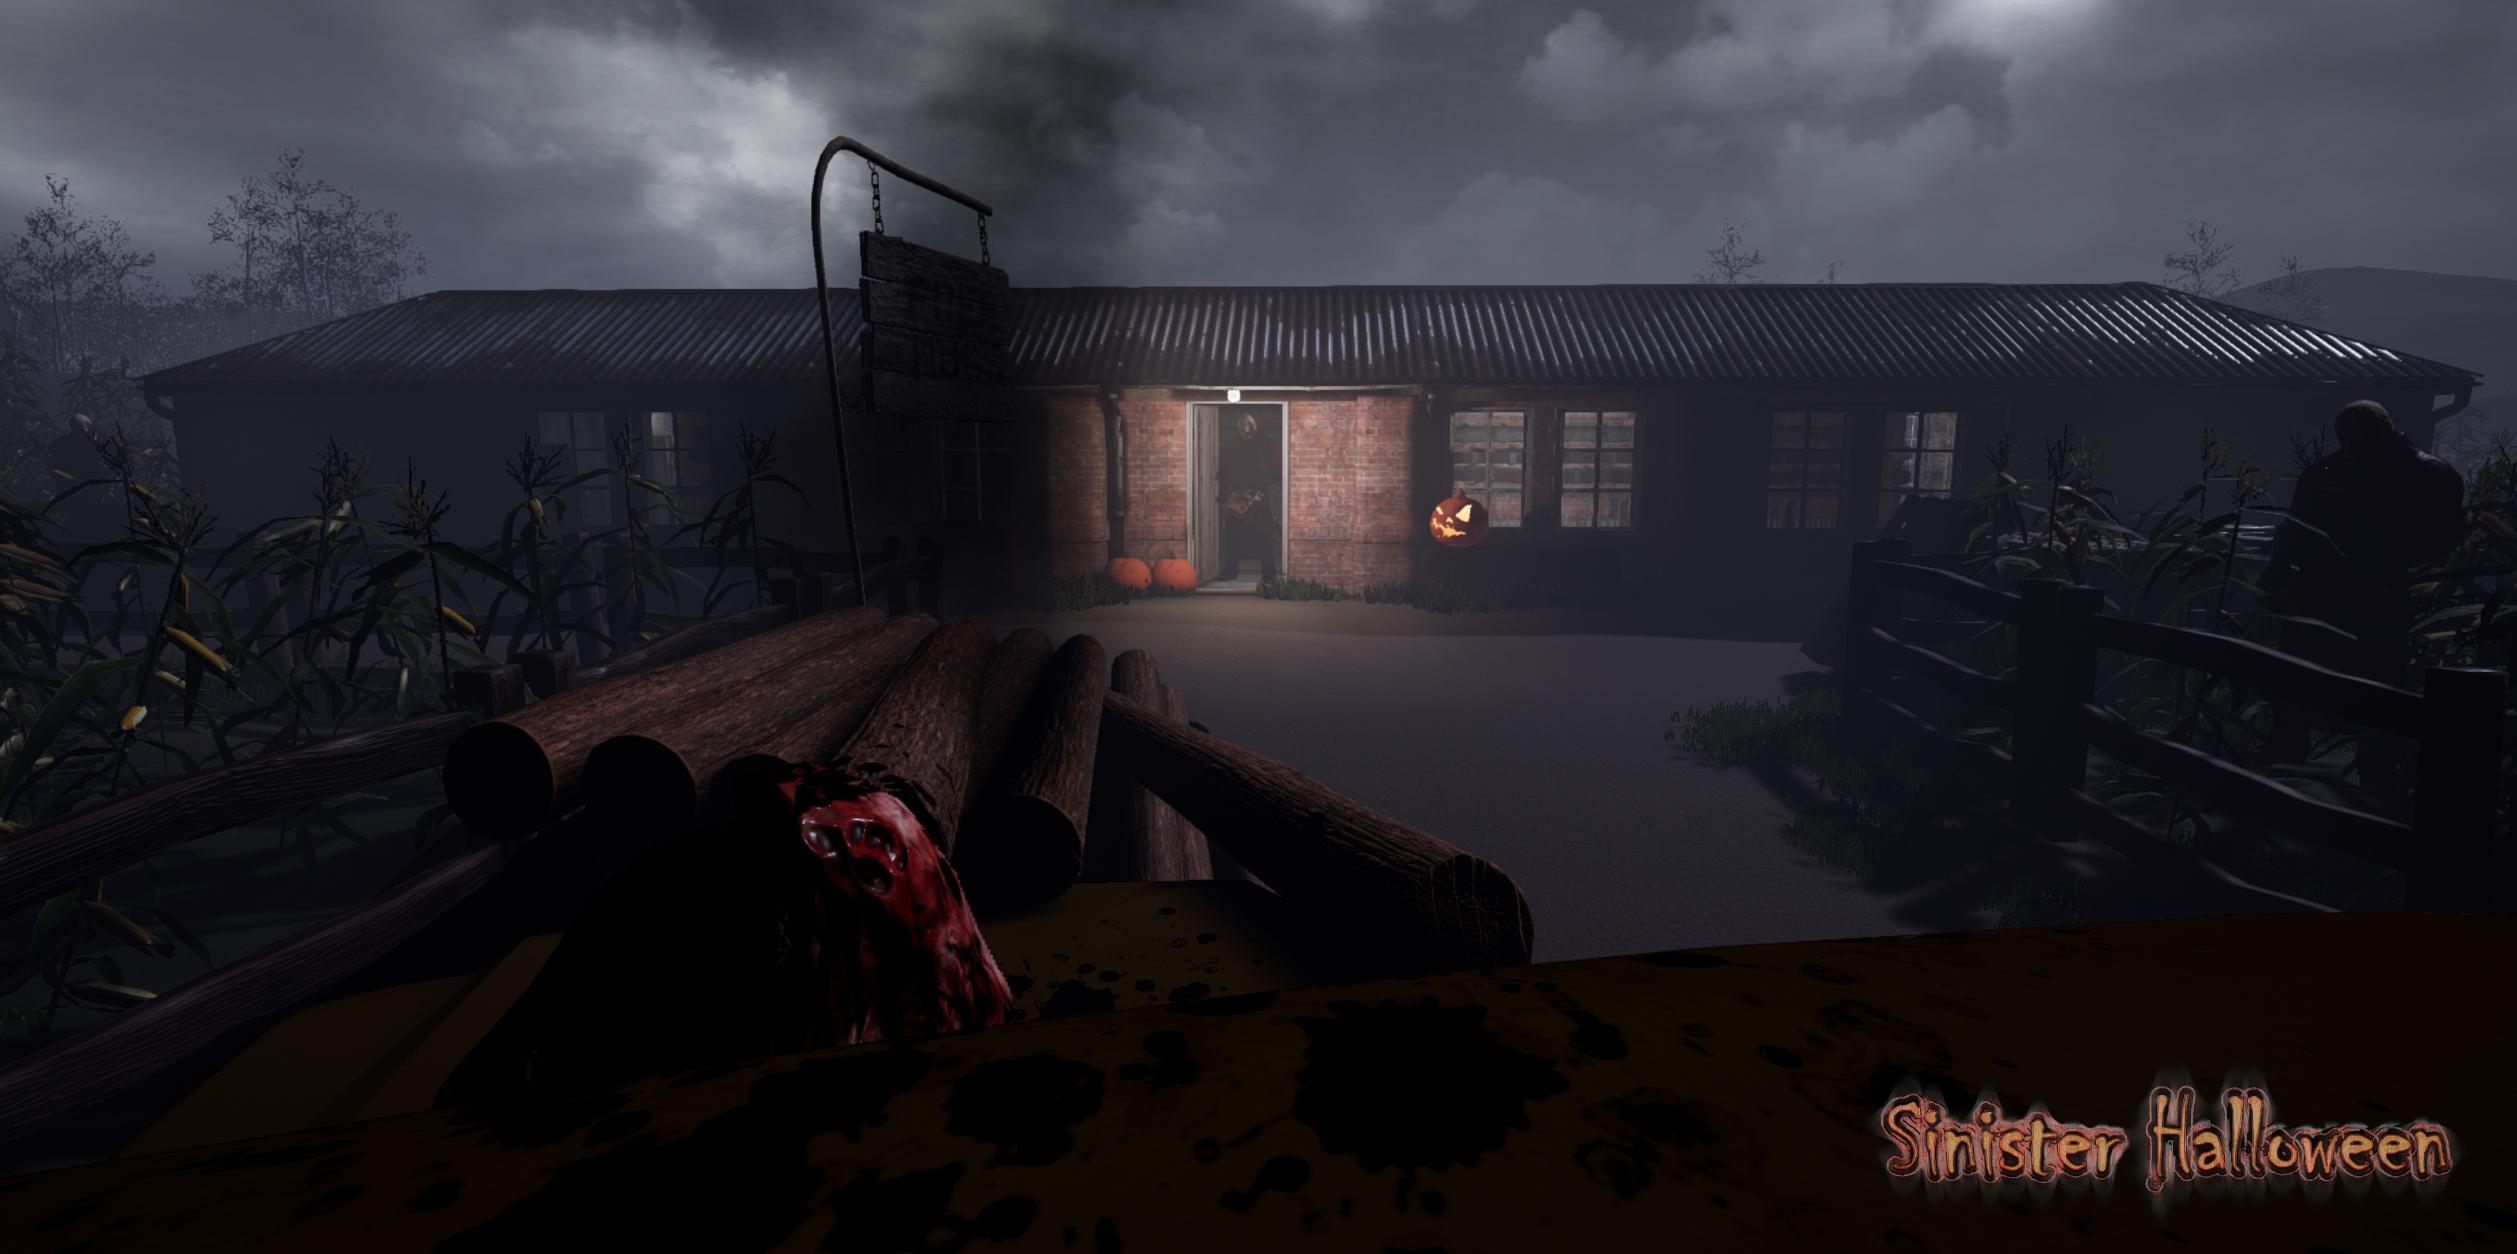 SlaughterReveal